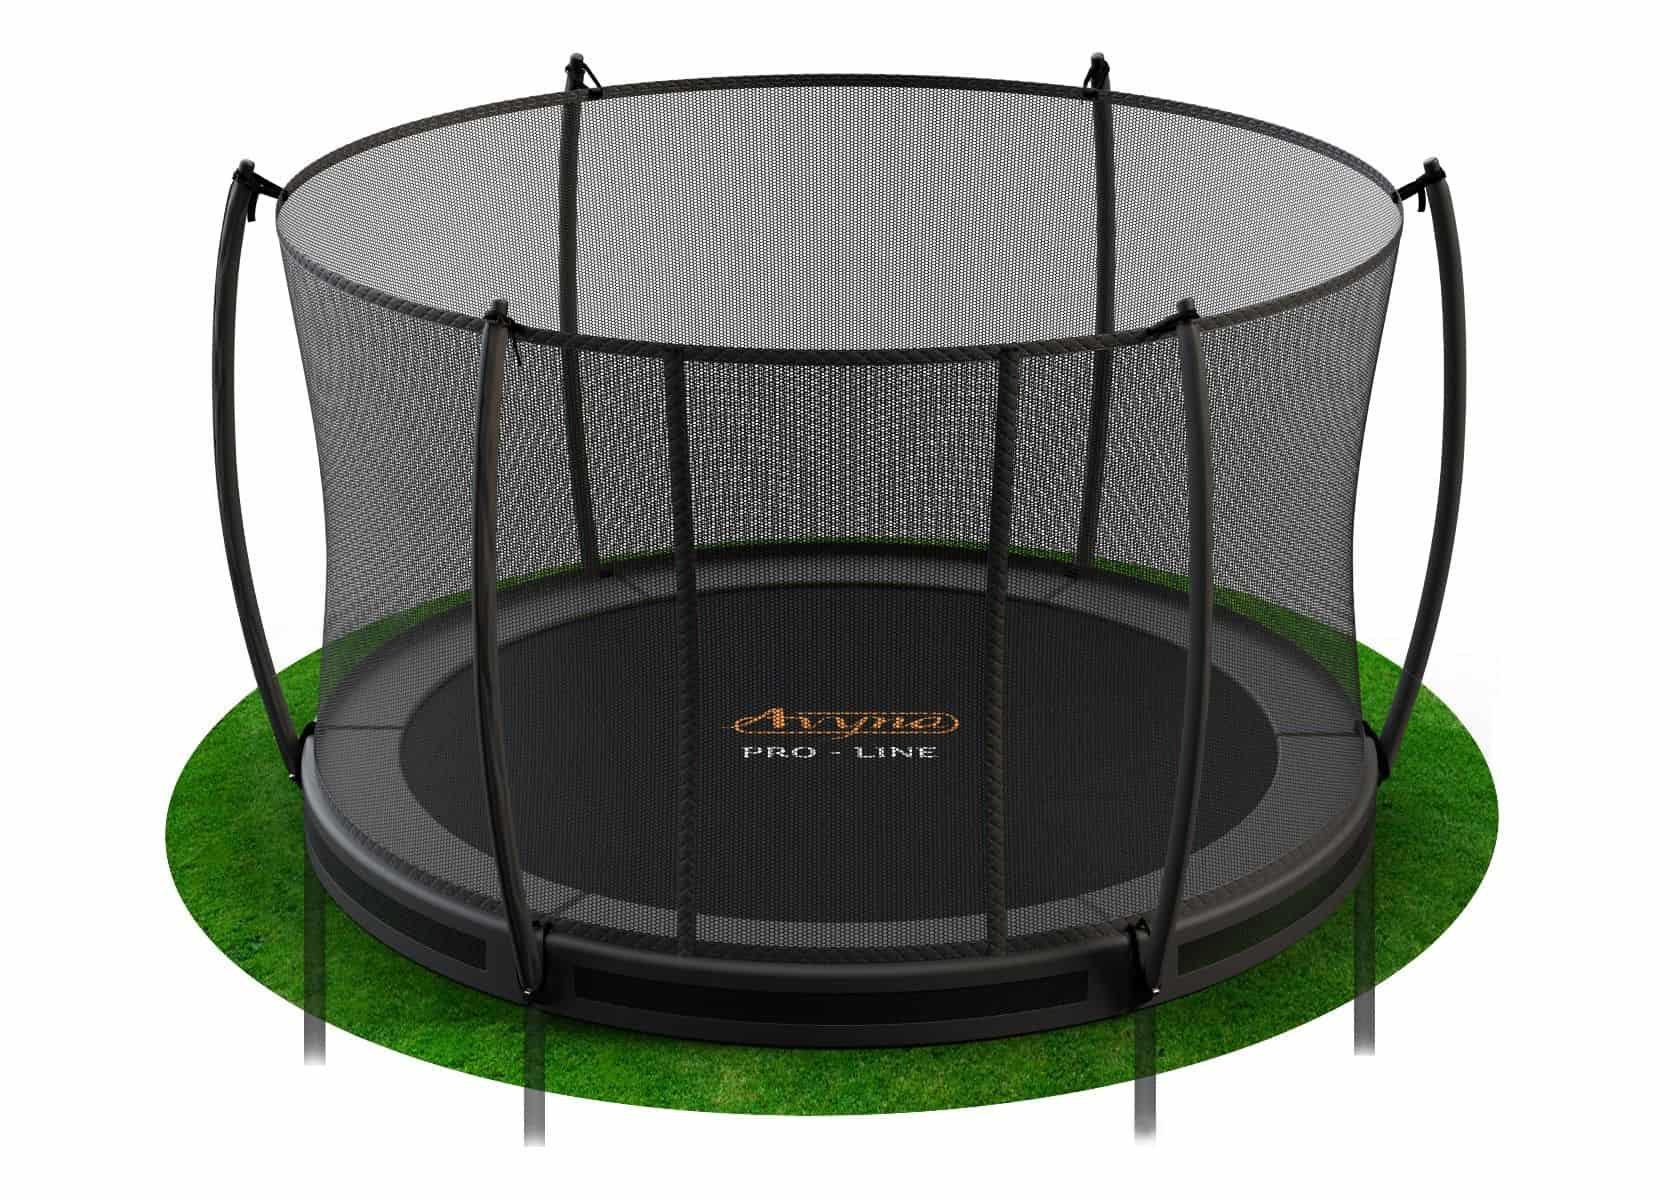 trampolines, Trampolines